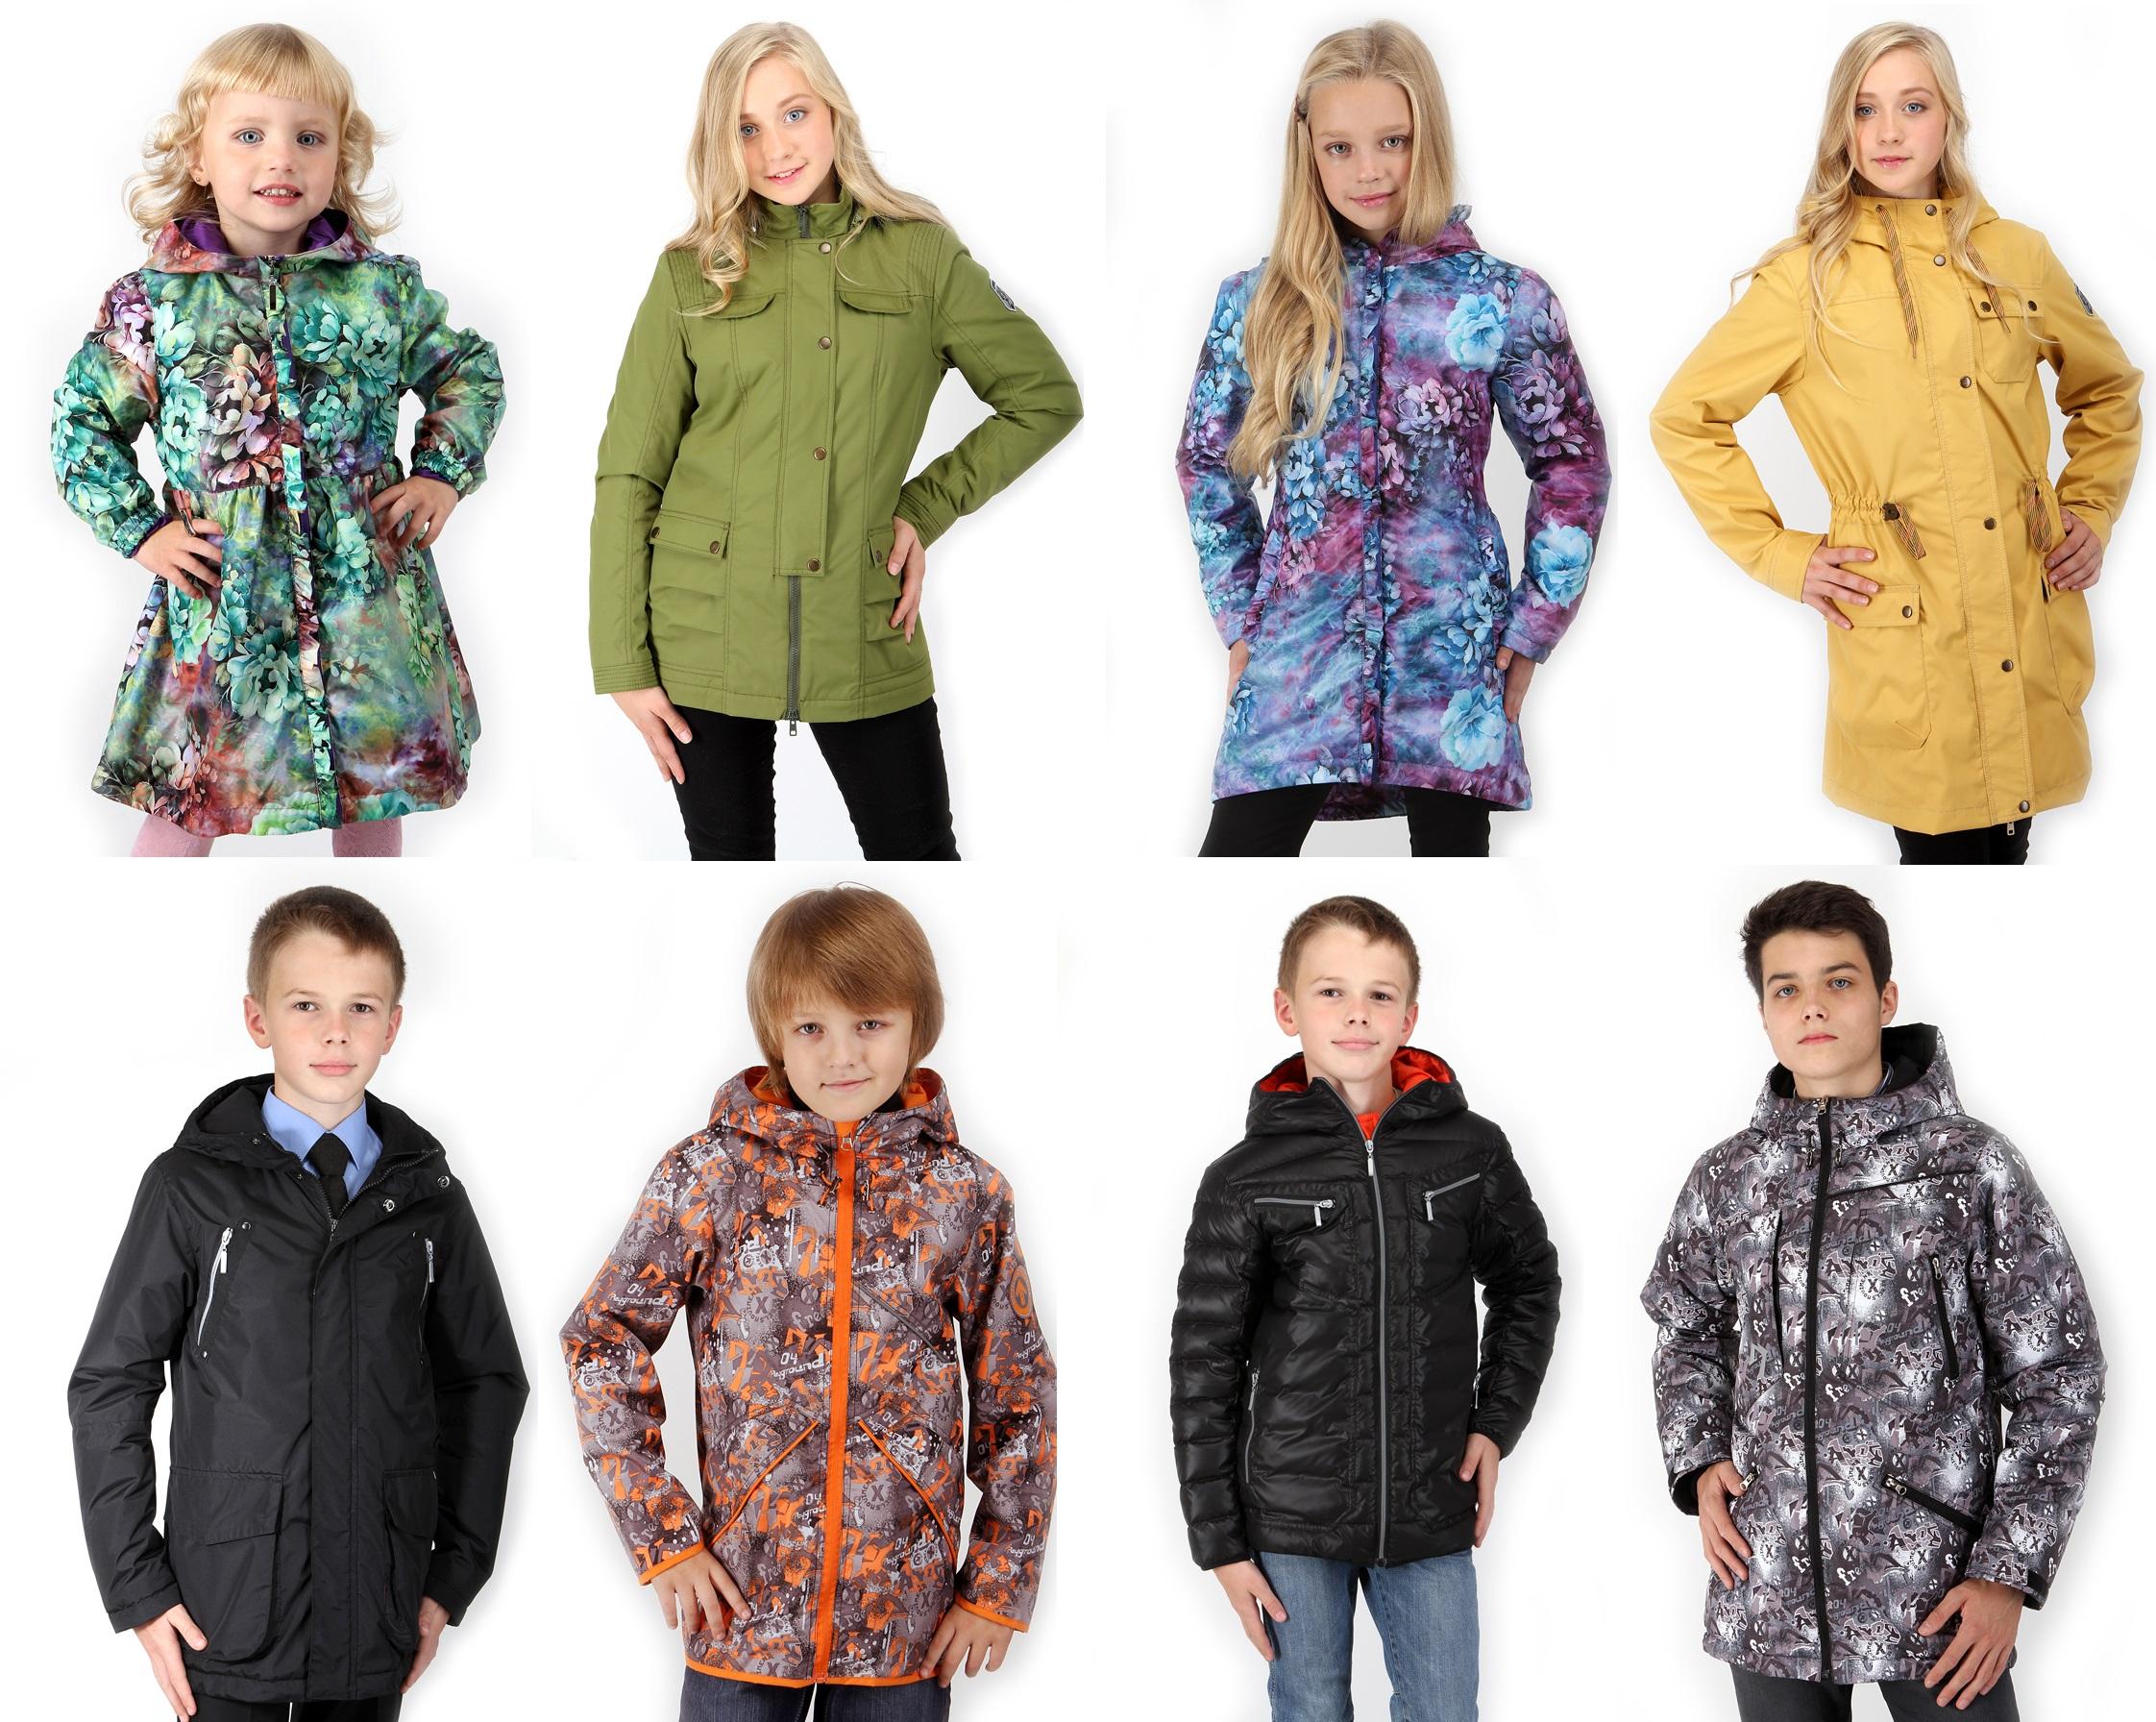 Модnо, классnо, тепlо и безопасnо - 25. От 86 до 176 размера. Весна 2015 парки - куртки, парки-ветровки. Есть распродажа!!! Без рядов!